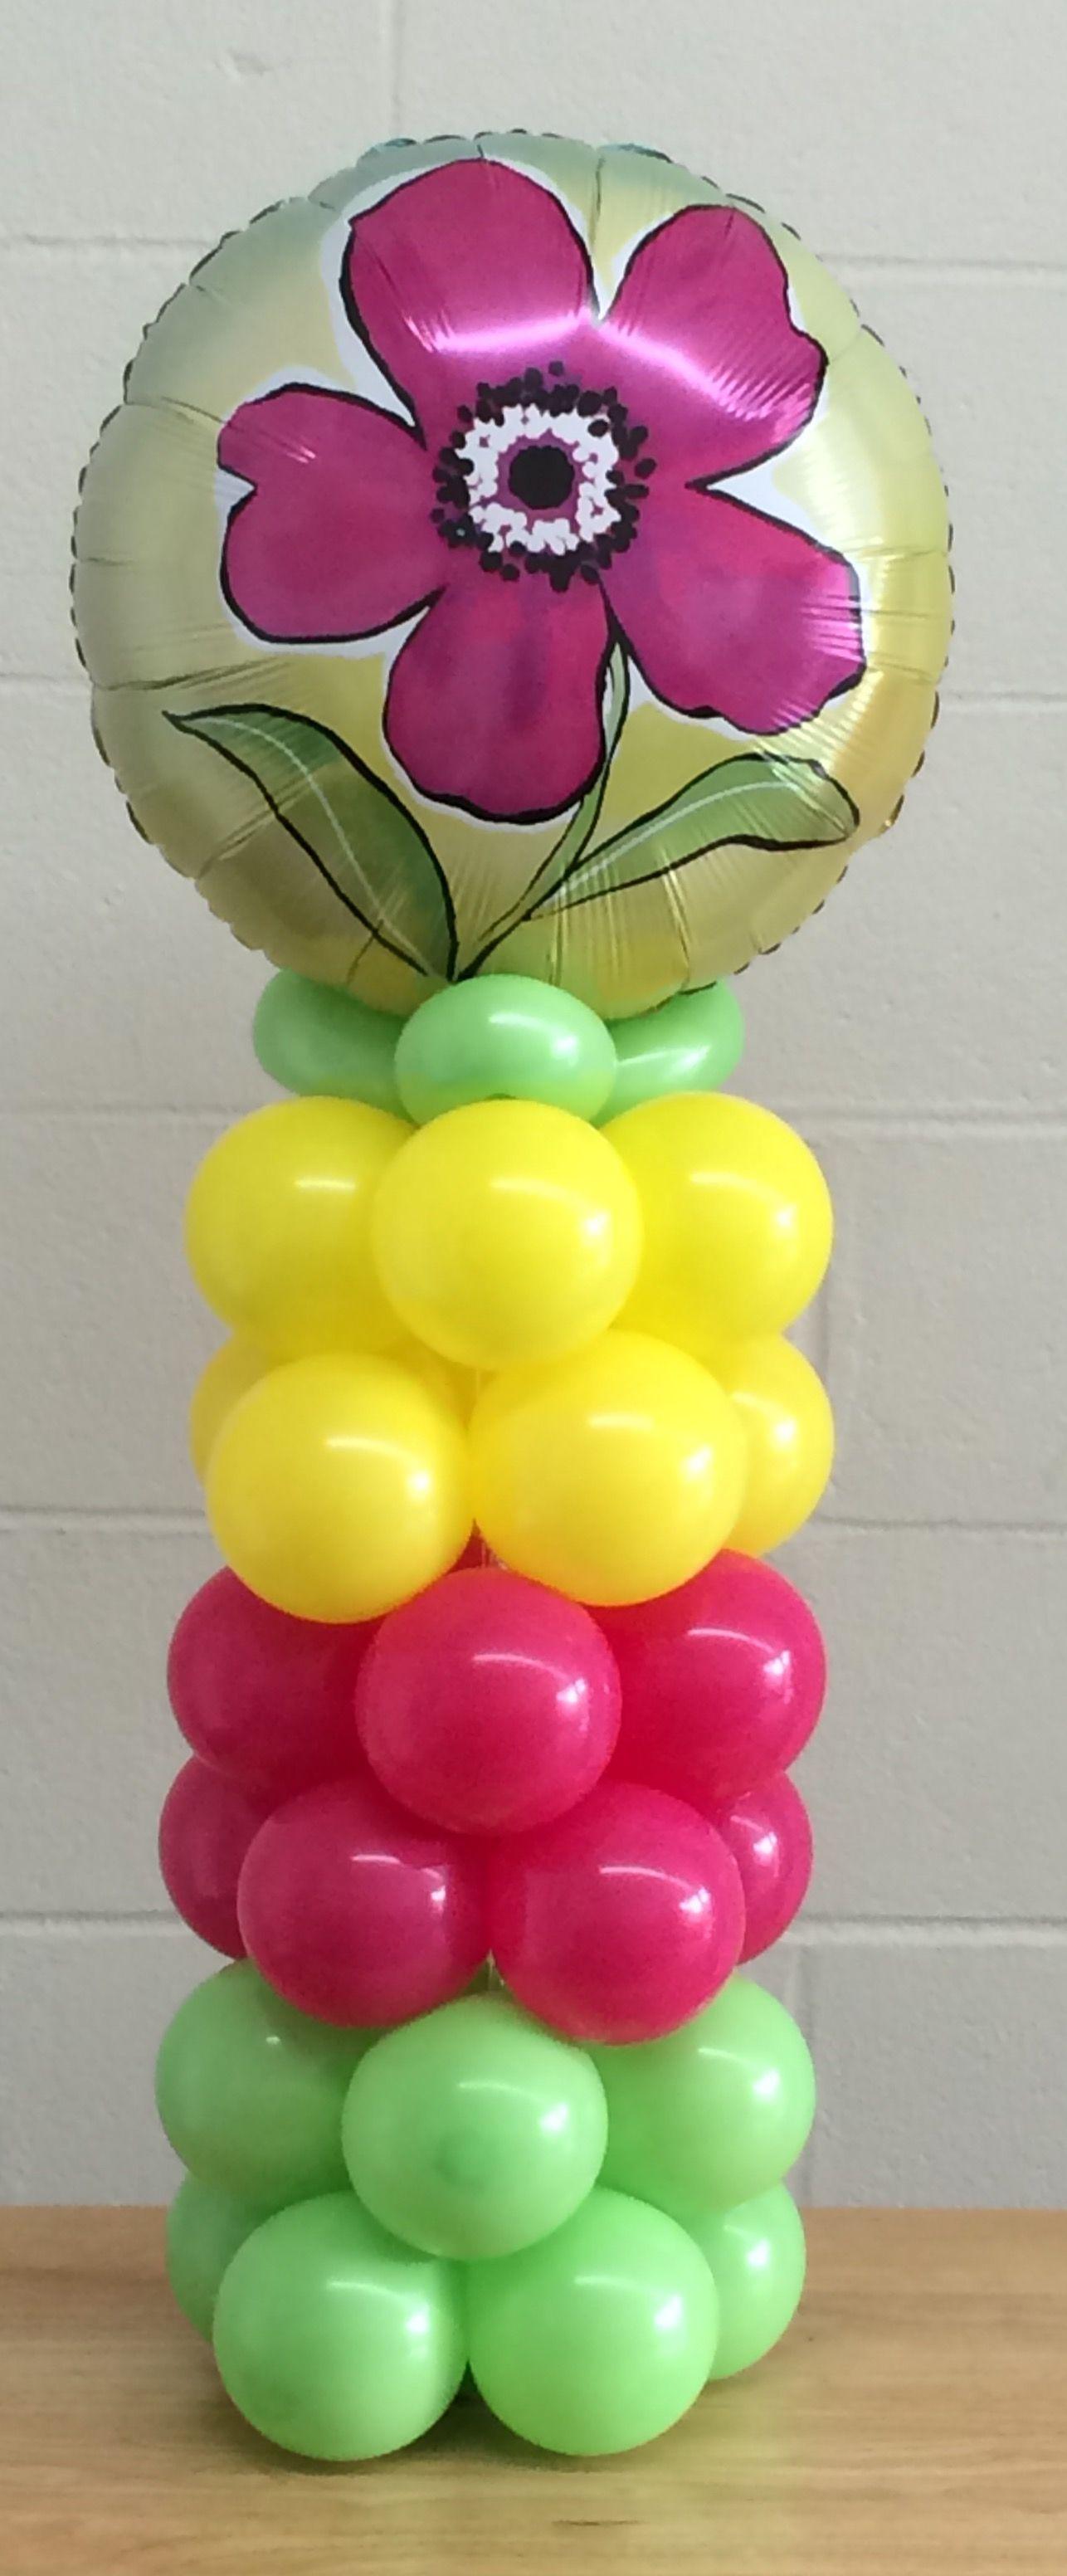 Pin by Celebrations Balloon Company on Balloon